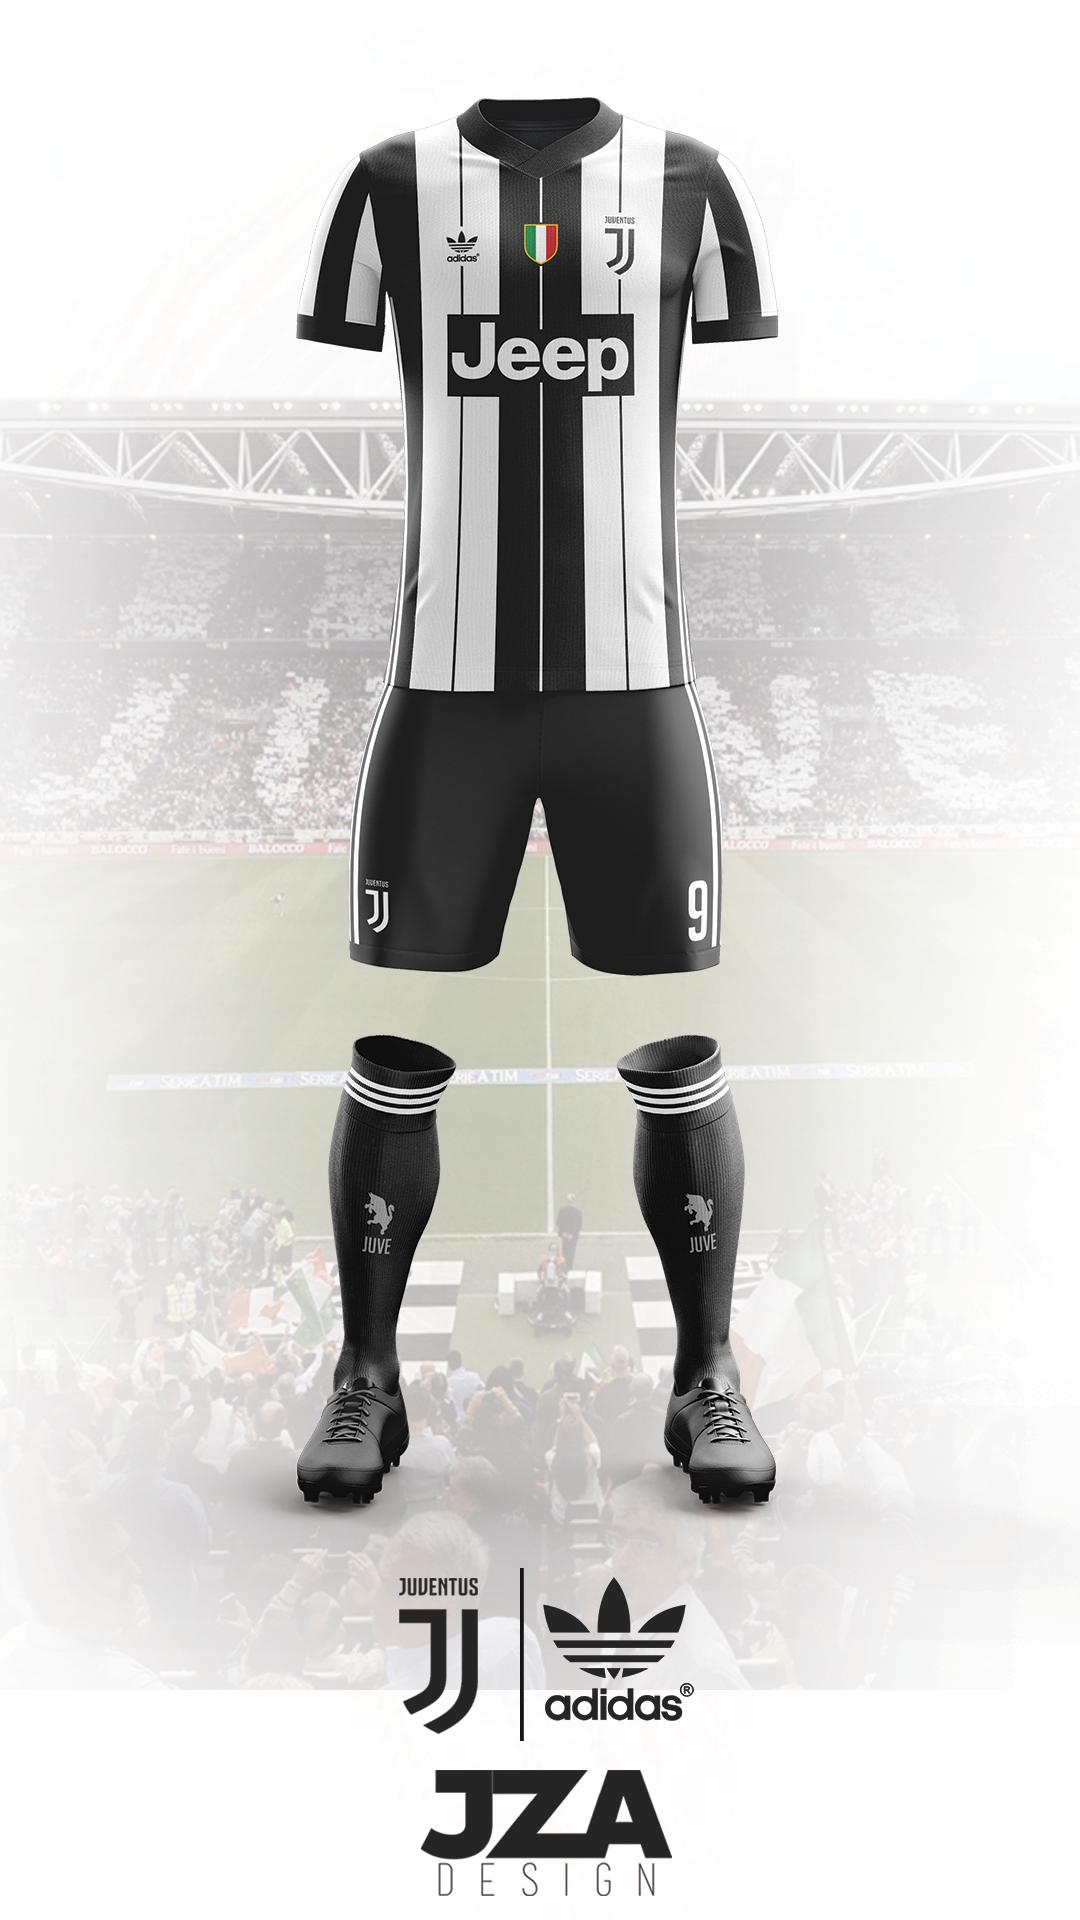 80427f75b67 Juventus 17 18 Home Kit Concept on Behance